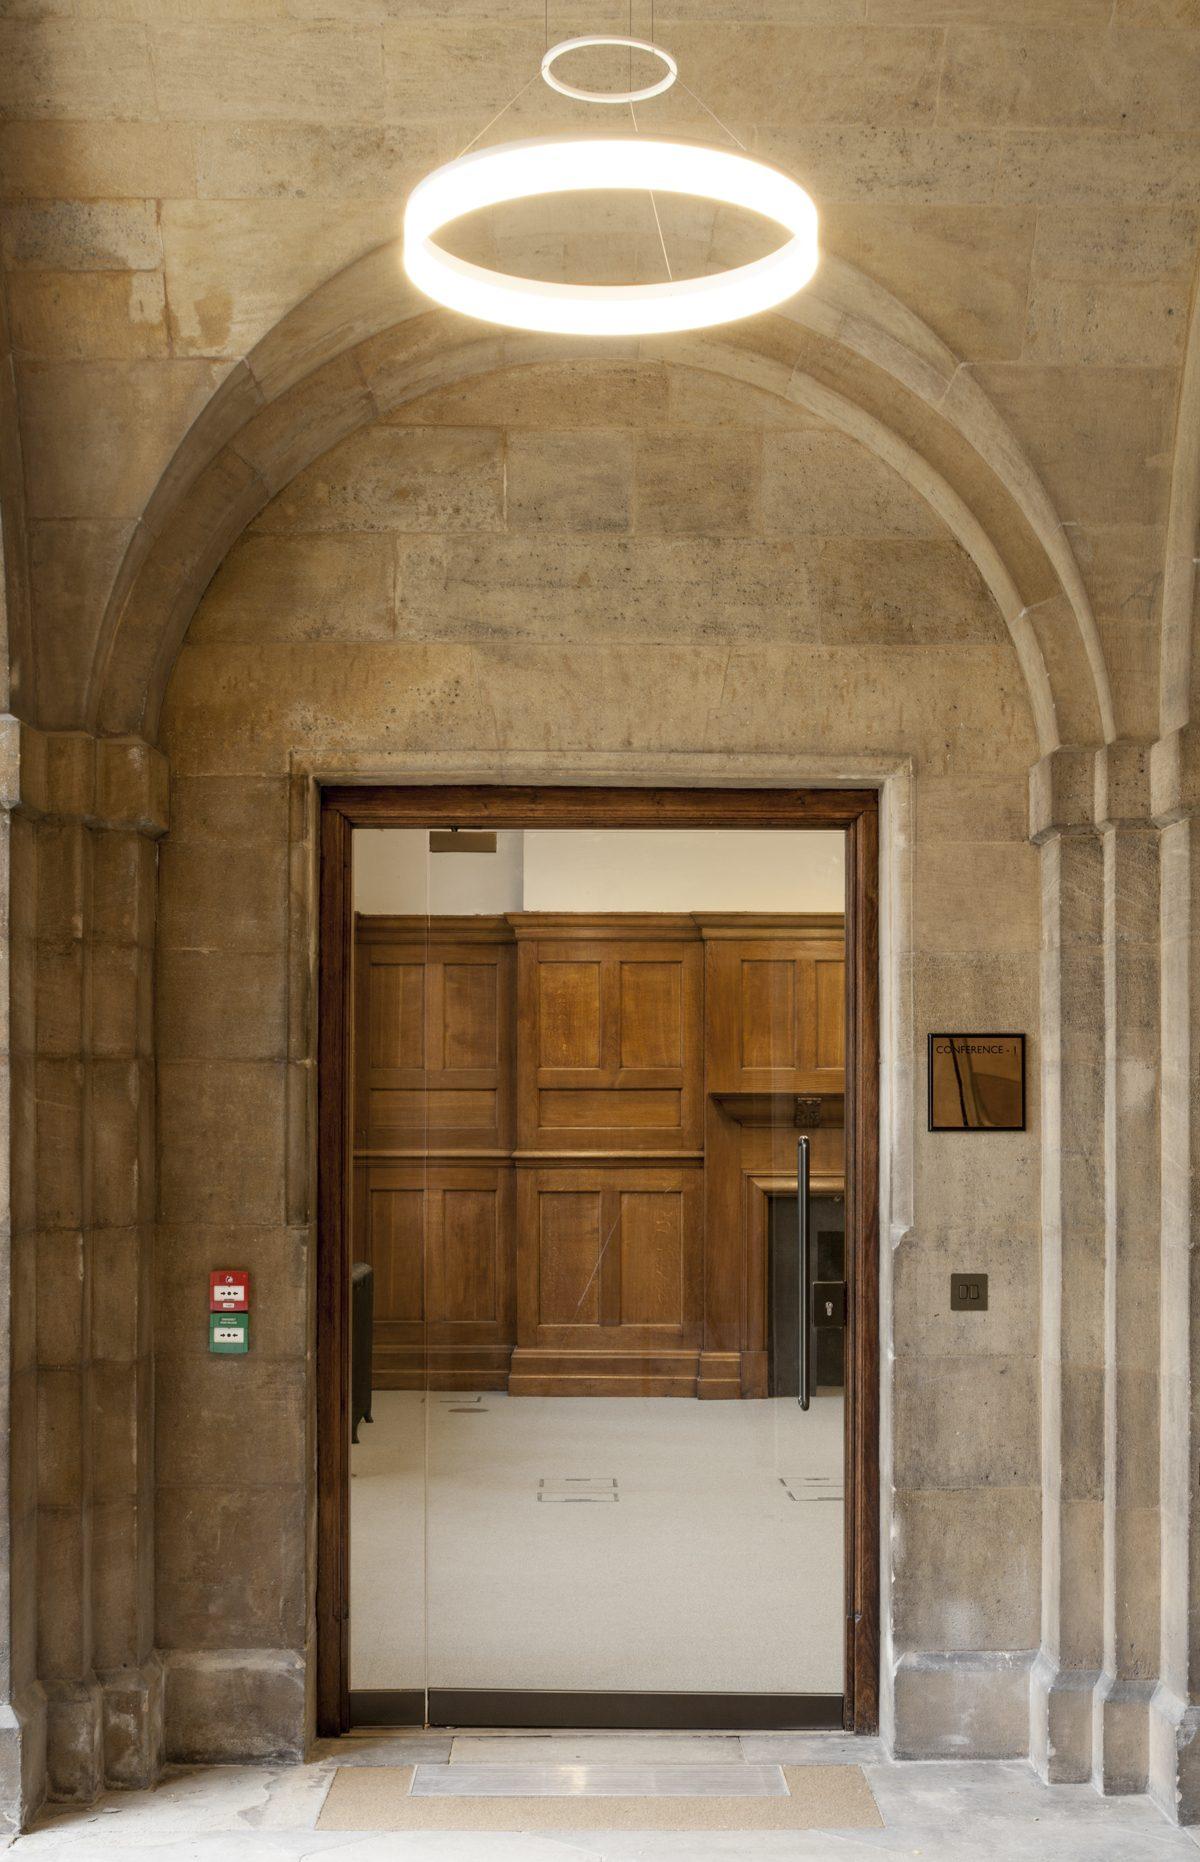 Rhodes Building, Oriel College,, Oxford - Exterior - Entrance